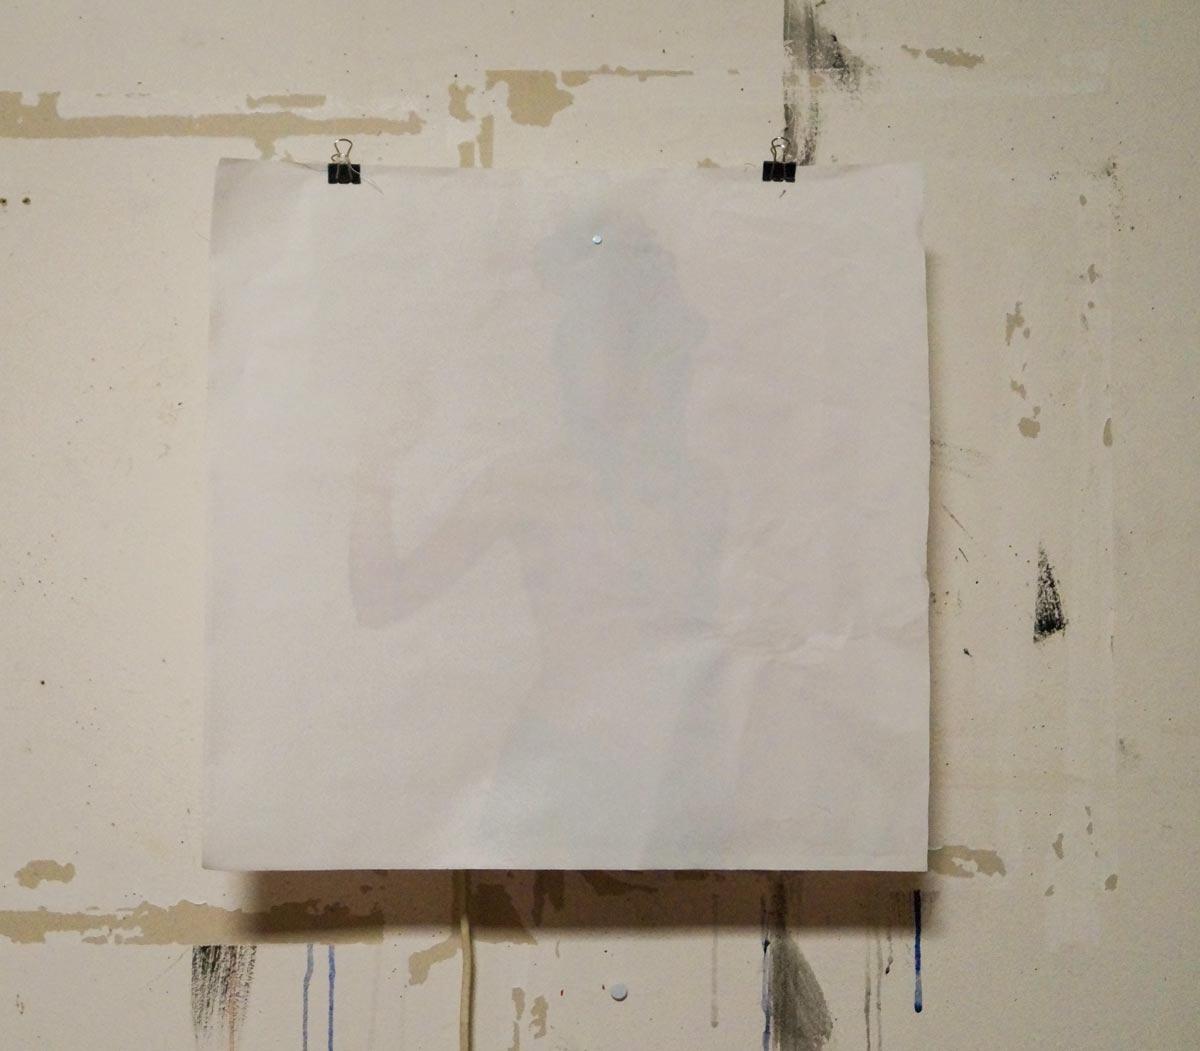 The waving girl. Prototype. 43 x 43 x 8 cm, Paper, layered Laserprints, Magnets, LED, HF motion sensor, fan